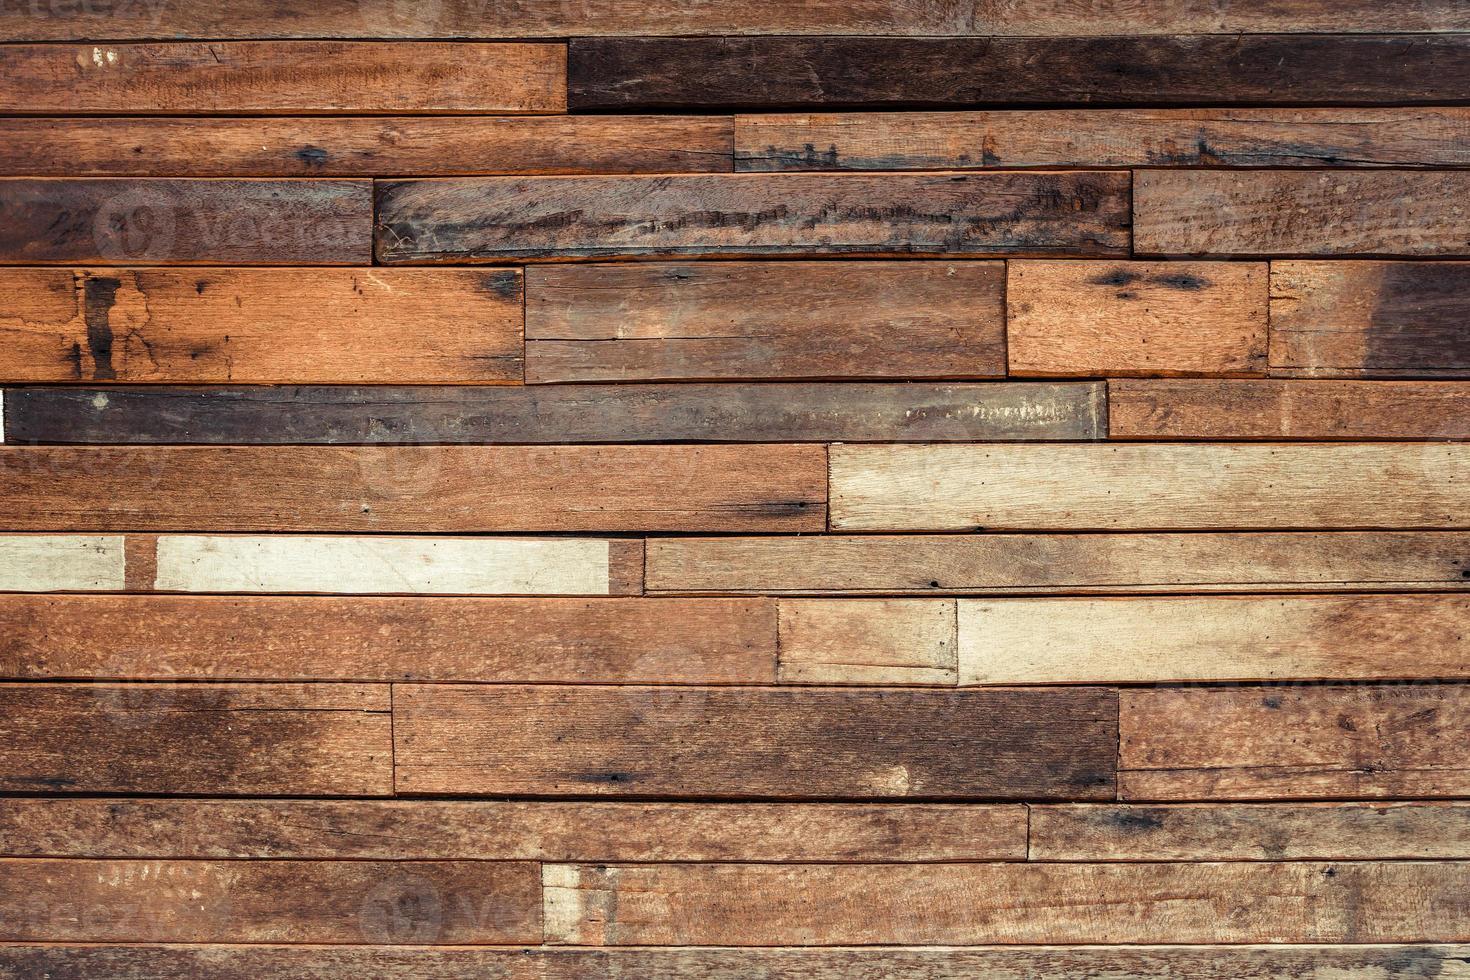 antigua muralla de tablones de madera foto